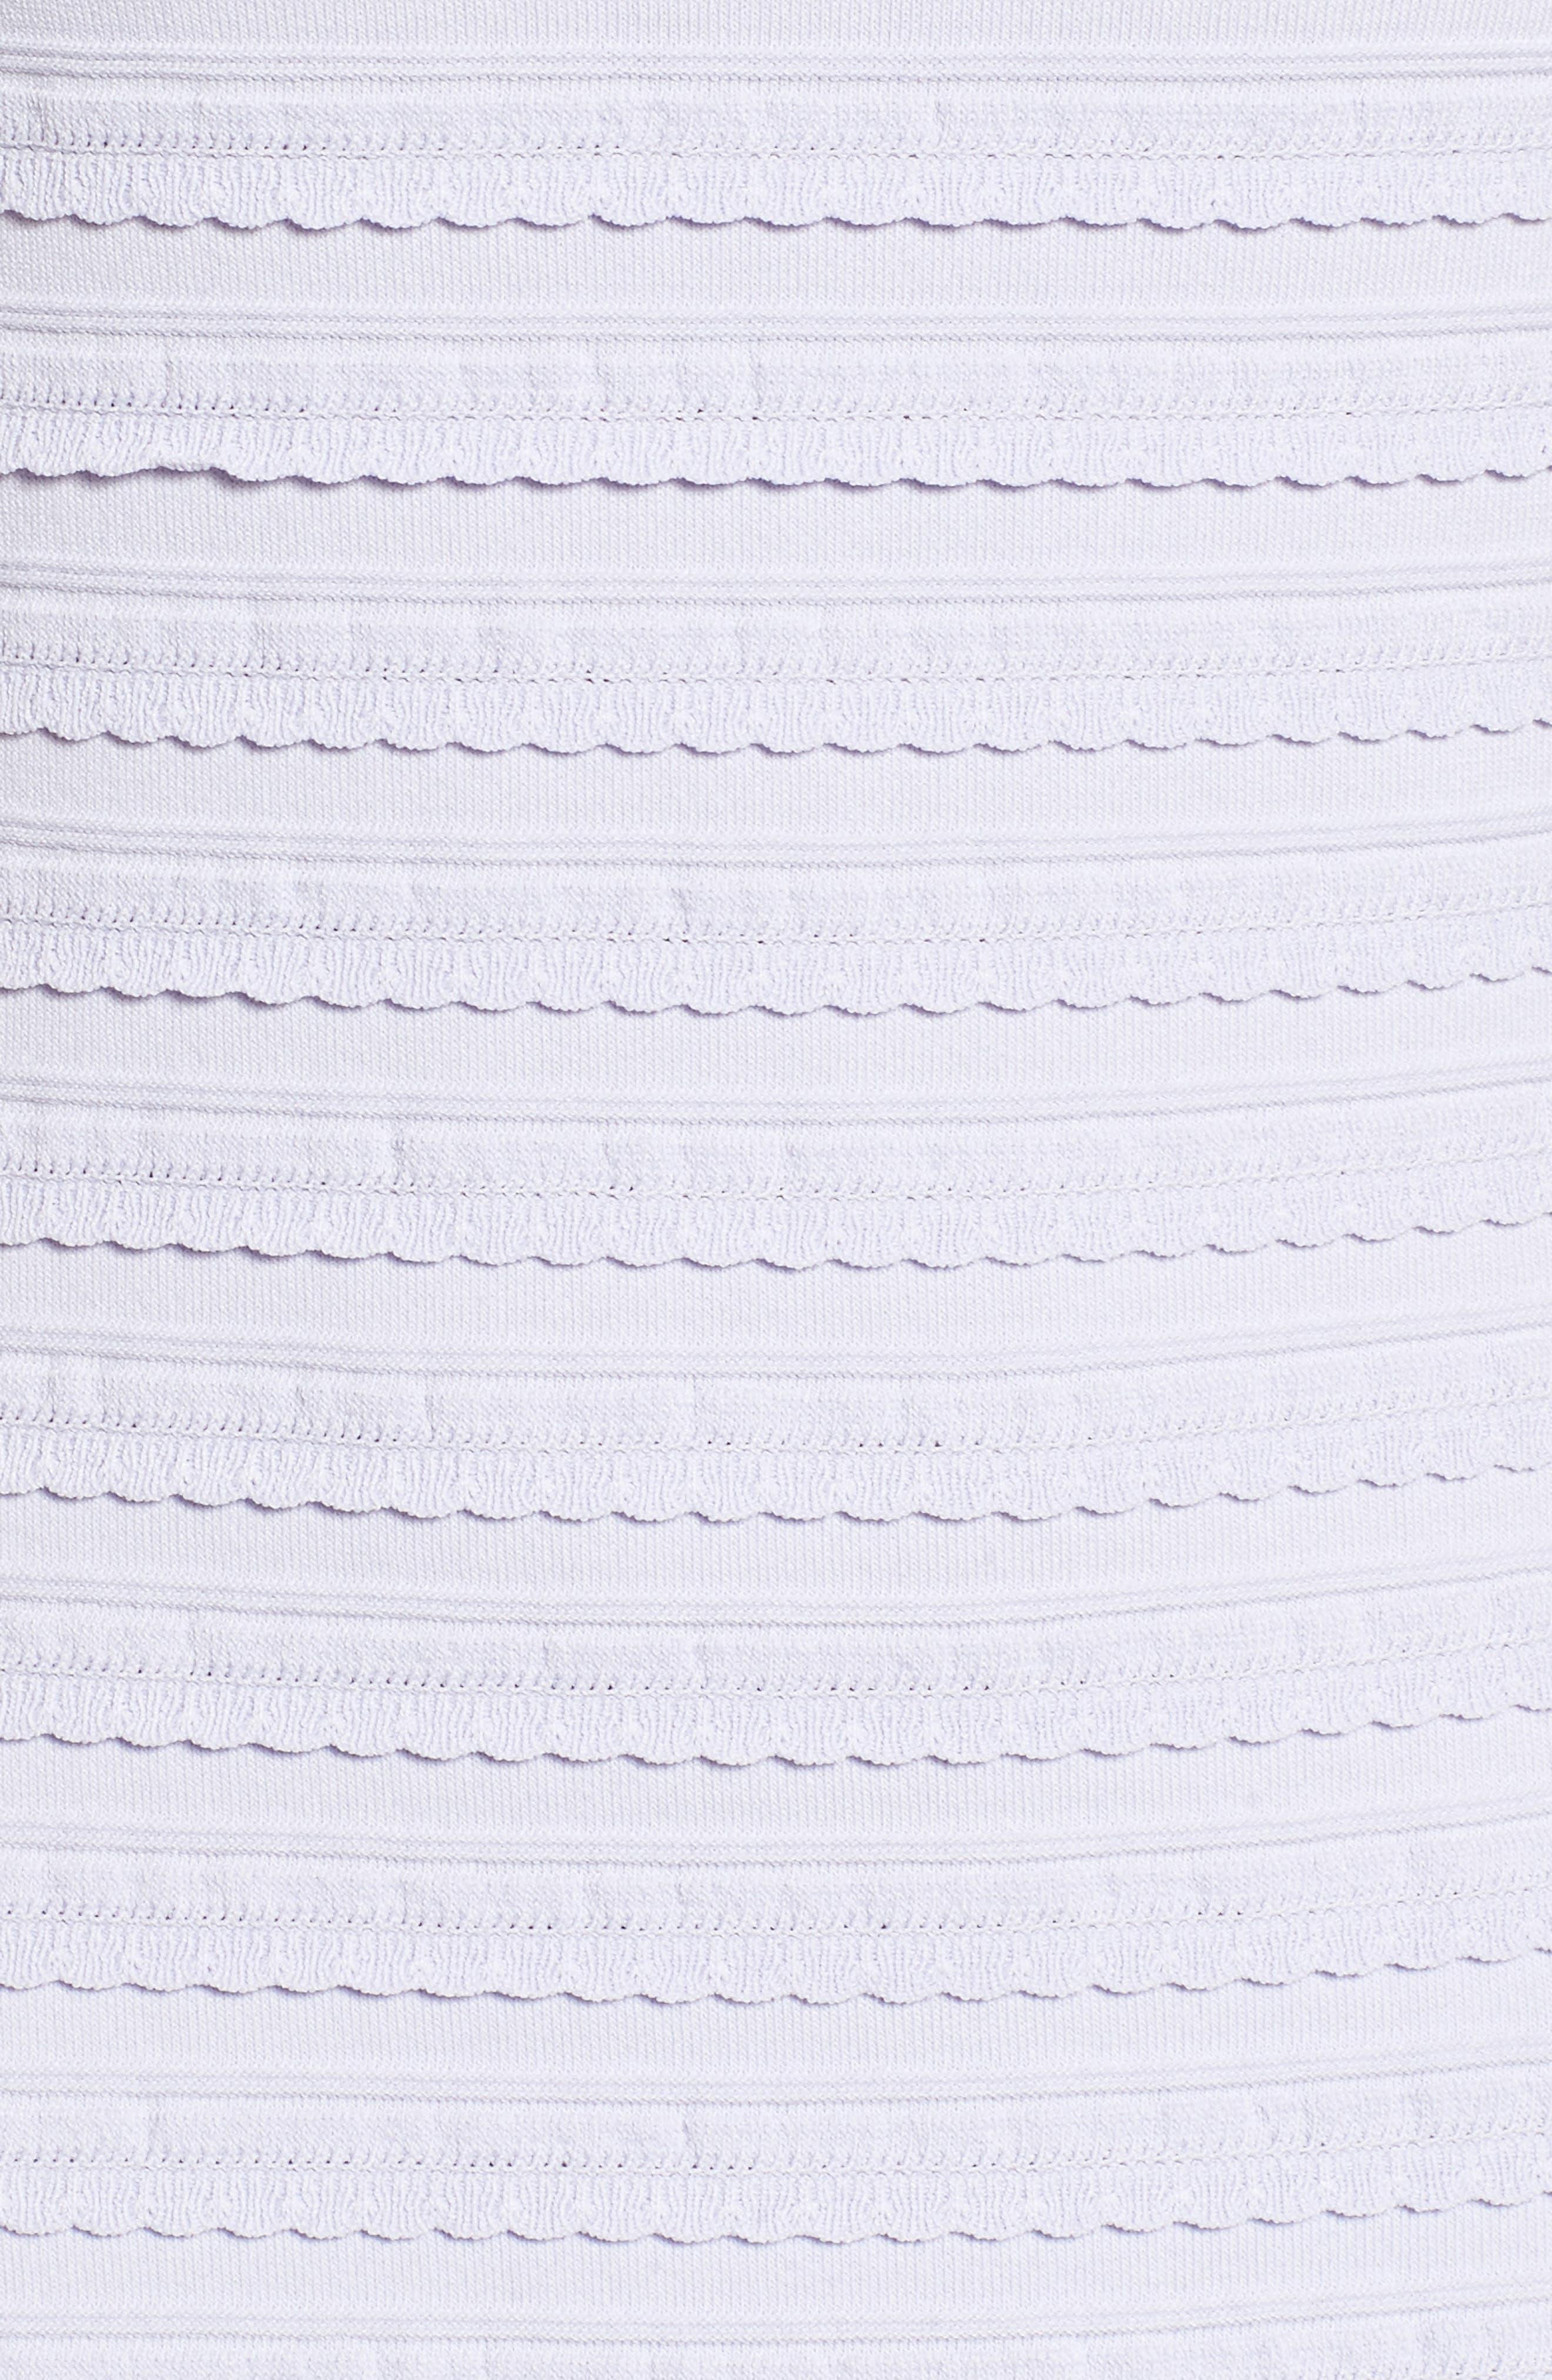 Tiered Sheath Dress,                             Alternate thumbnail 5, color,                             Light Quartz